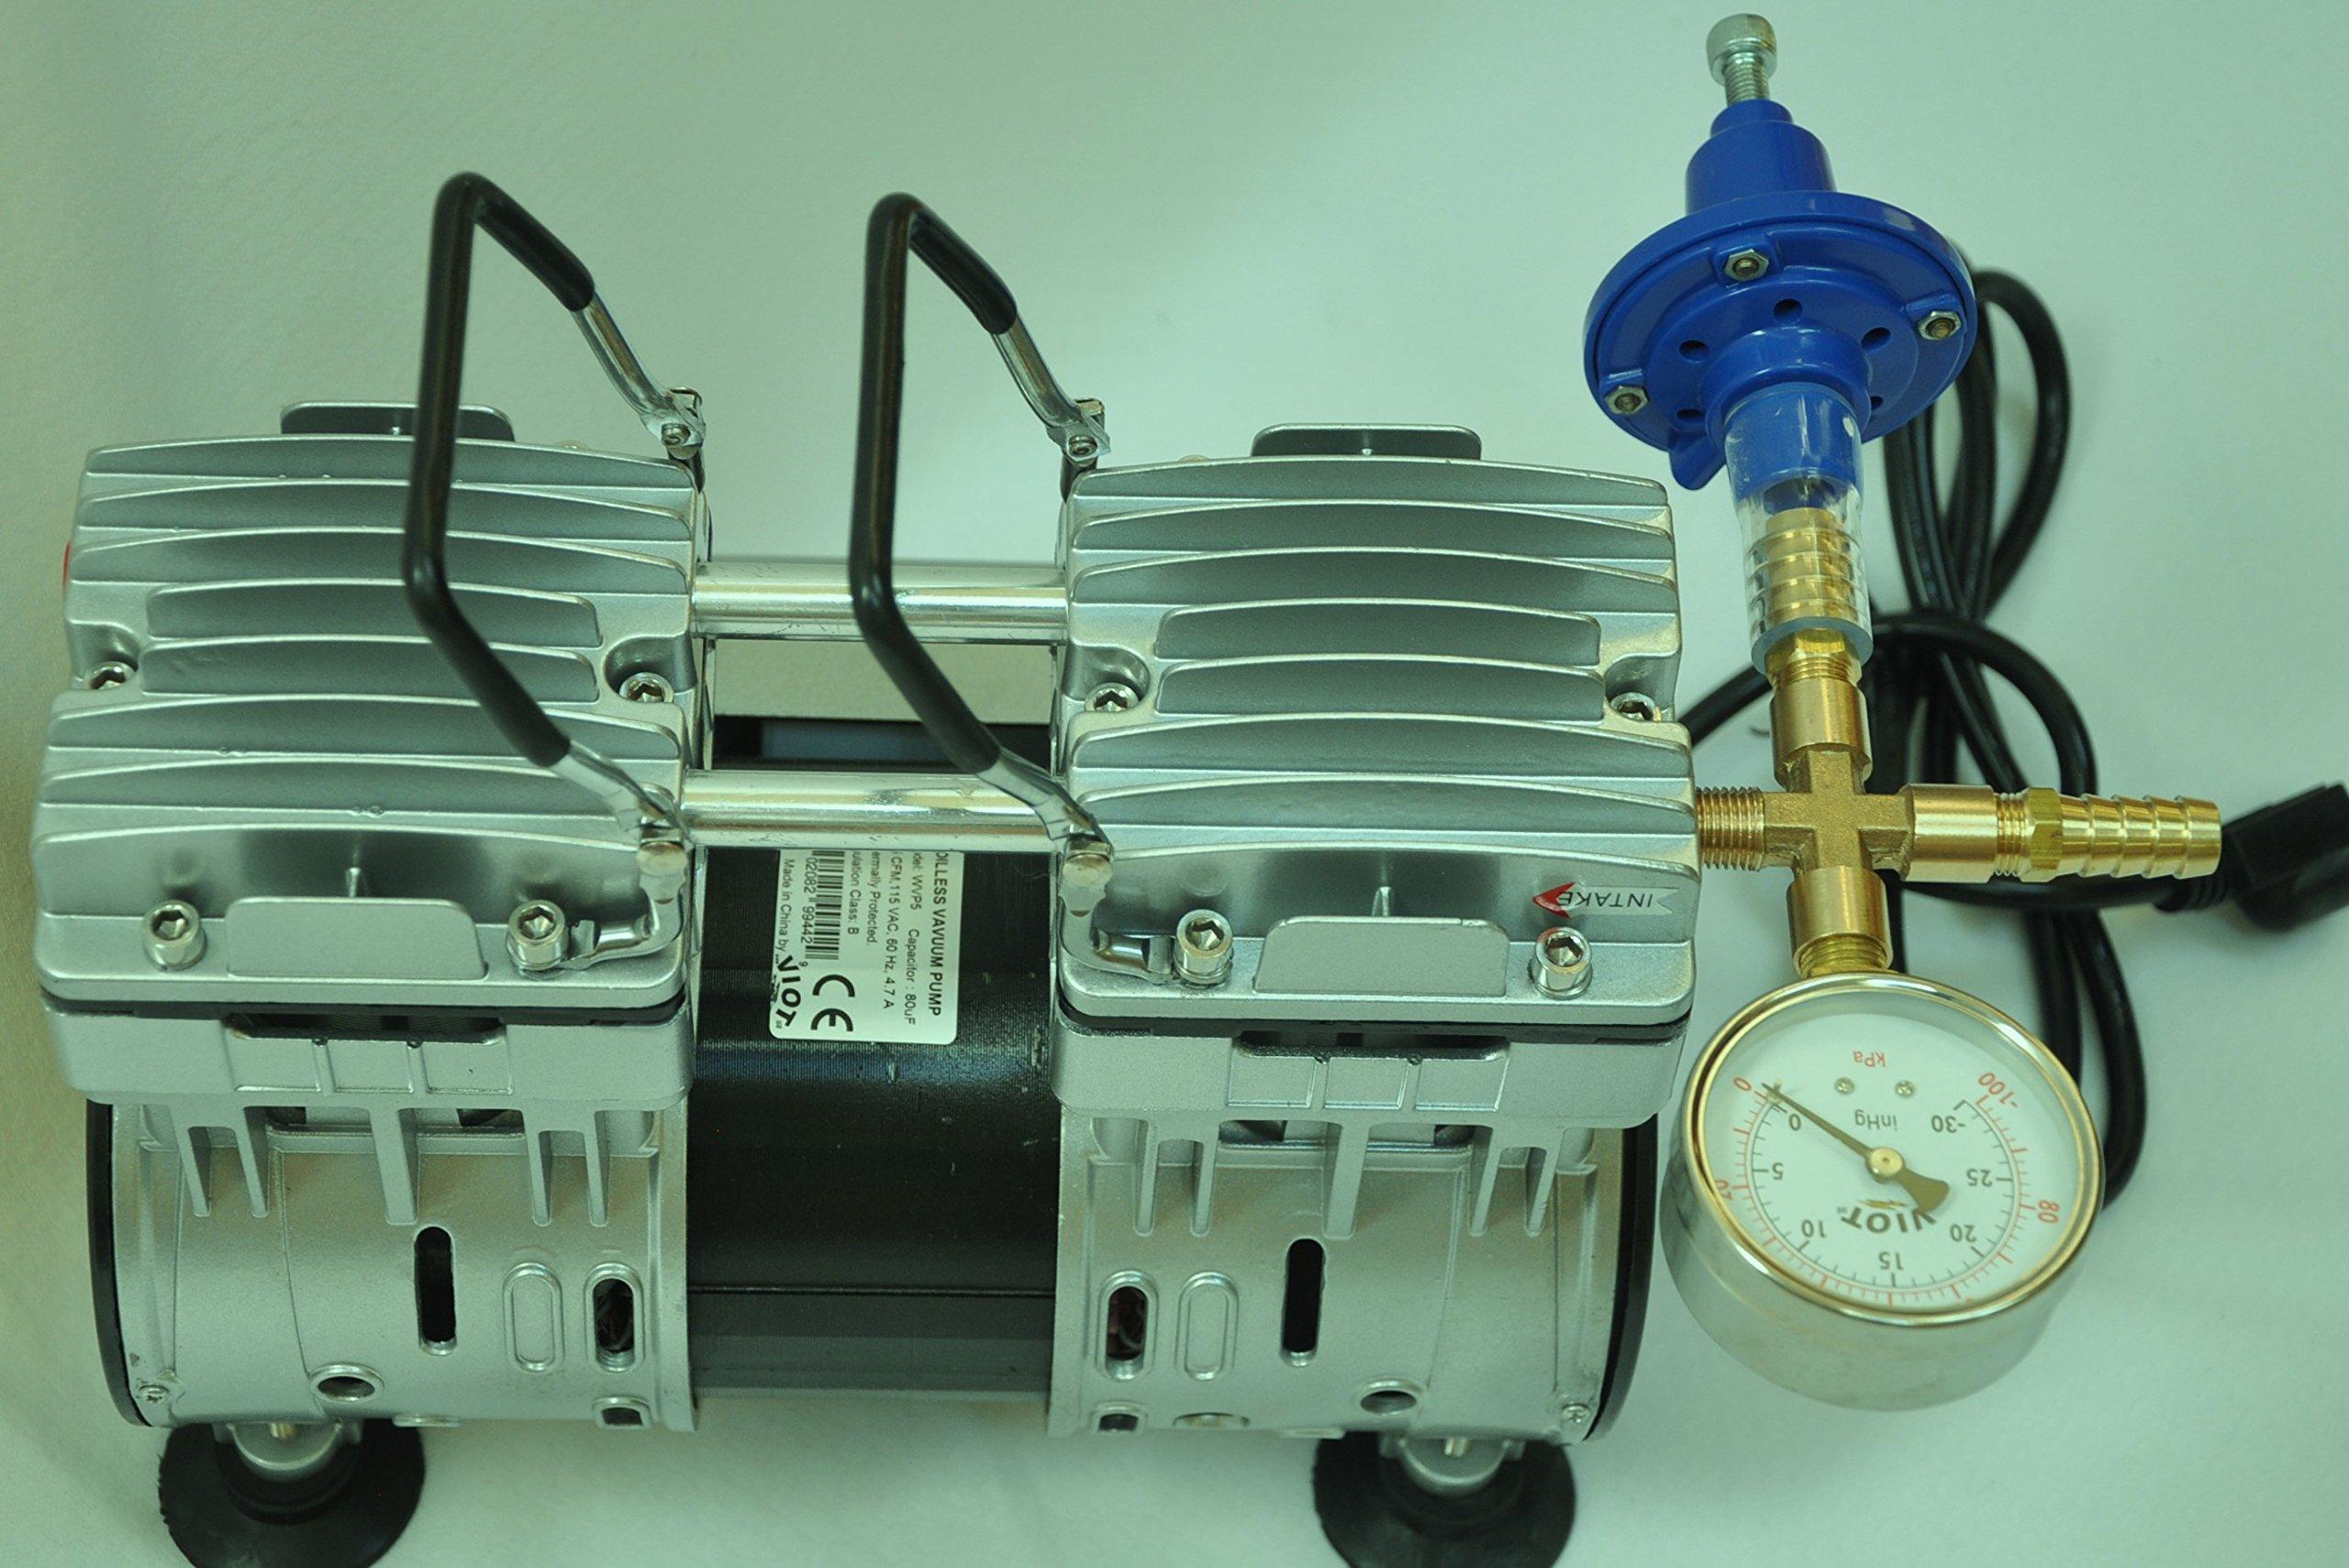 Controlled Twin Piston Oil-less Vacuum Pump 5.5CFM 3/4HP Regulator/Gauge Hardware Kit Pressure Control Oil-Free Clean No Oil Mist by VIOT